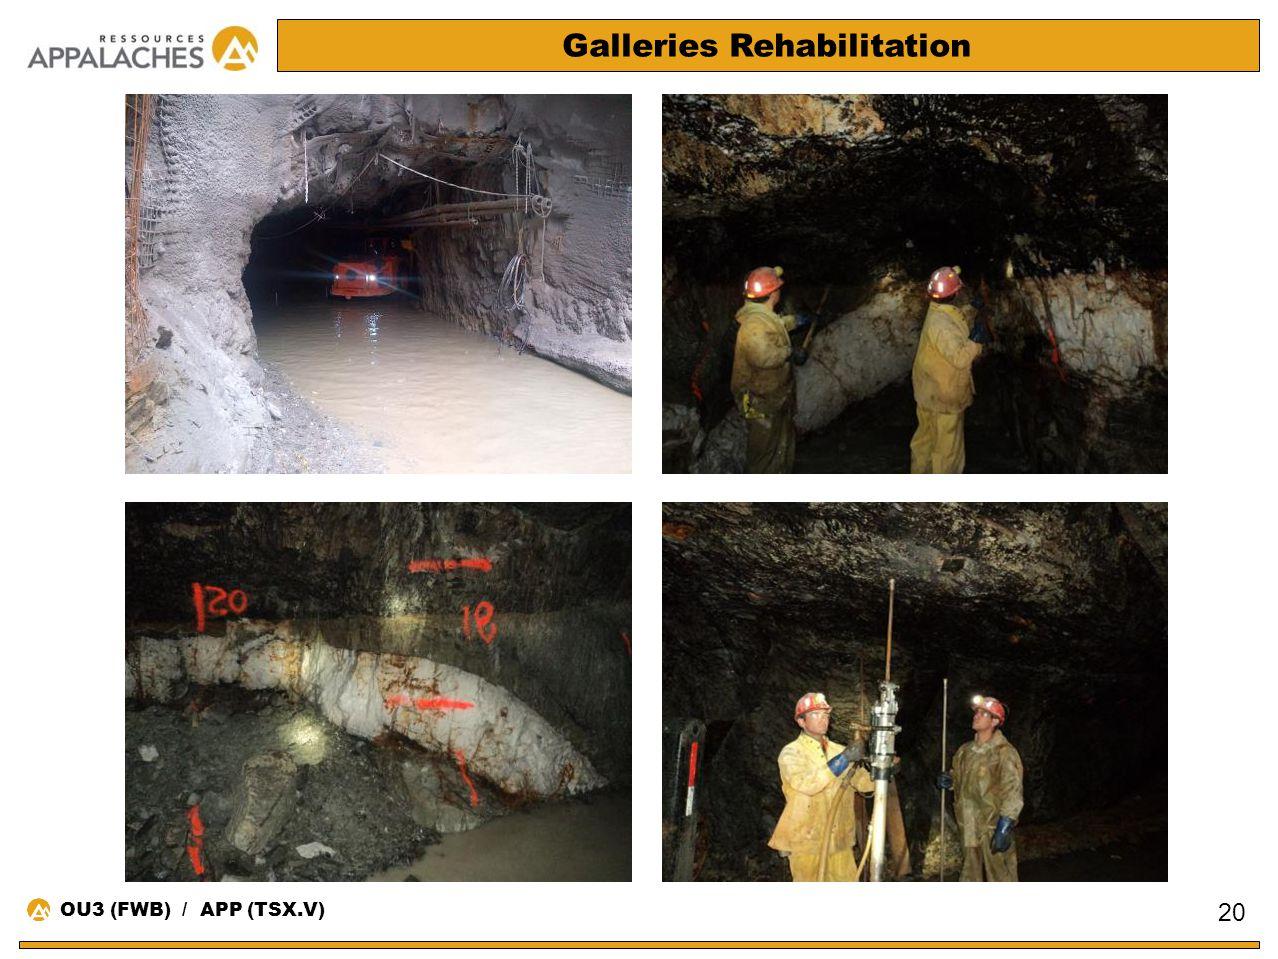 Galleries Rehabilitation 20 OU3 (FWB) / APP (TSX.V)